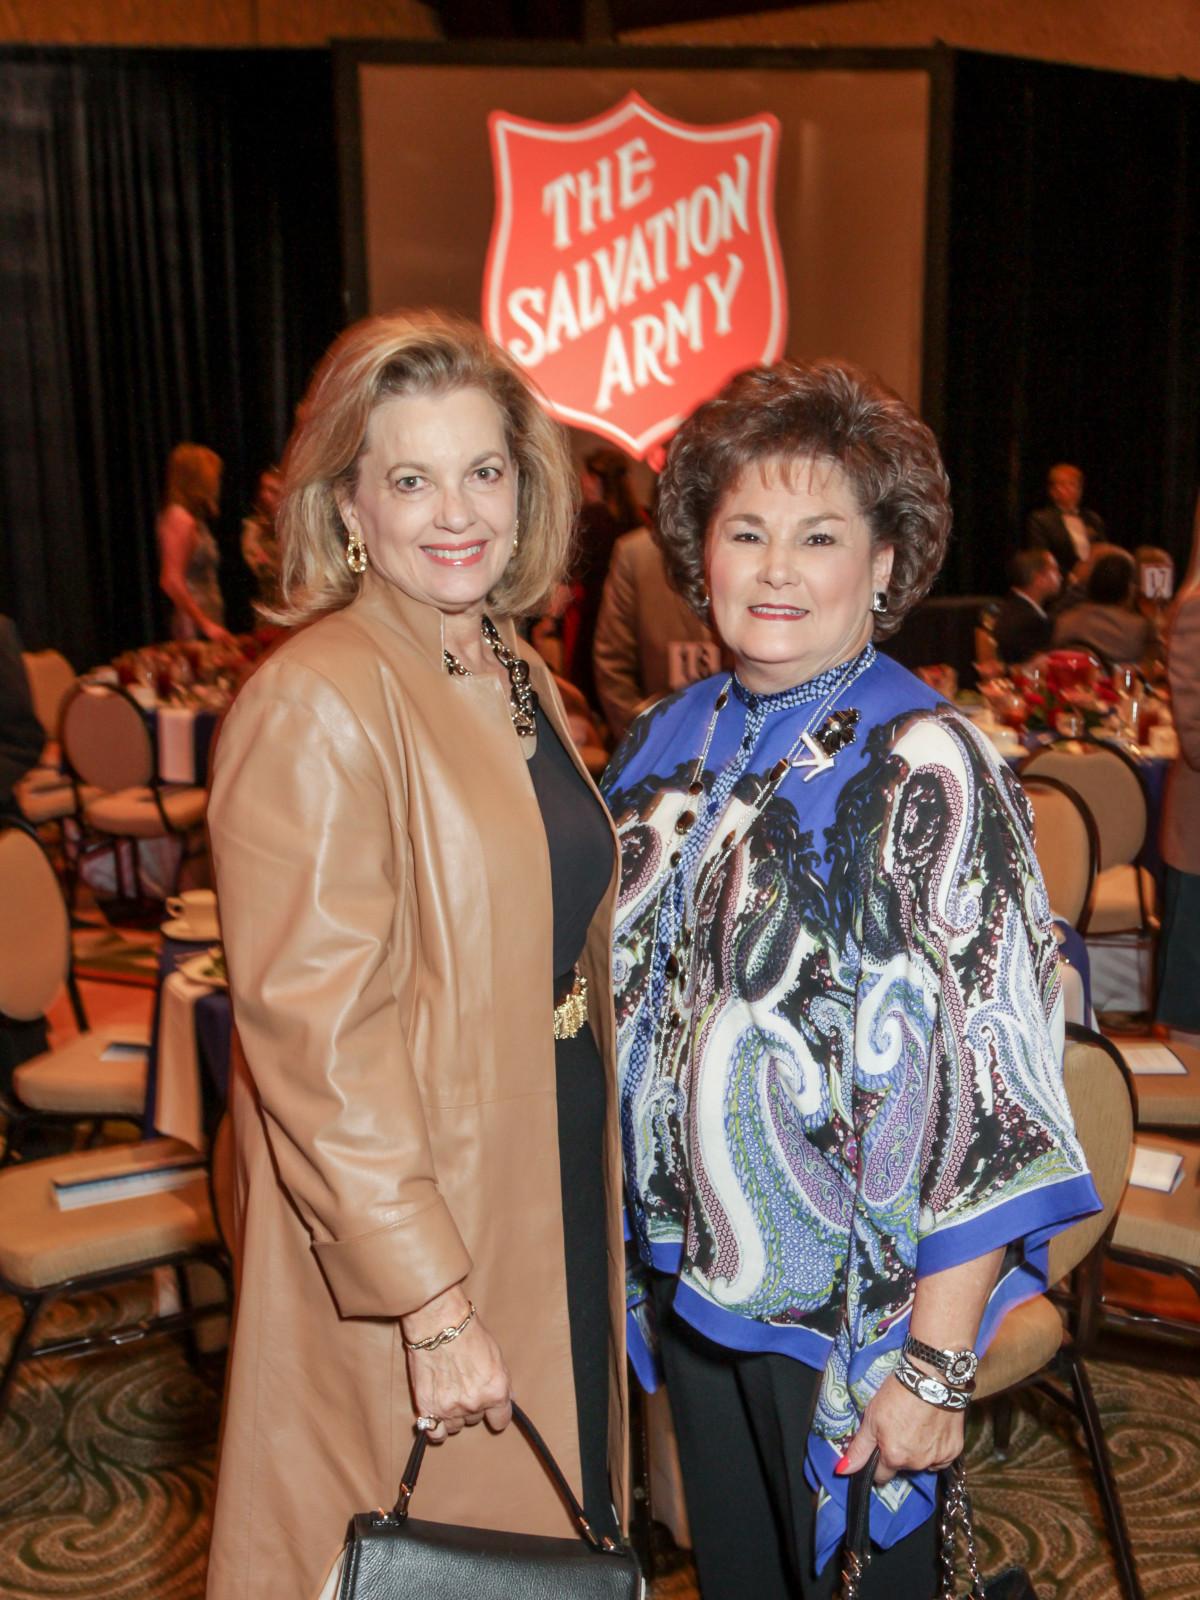 News, Shelby, Salvation Army luncheon, Nov. 2015, Nancy Gordon, Barbara Robertson